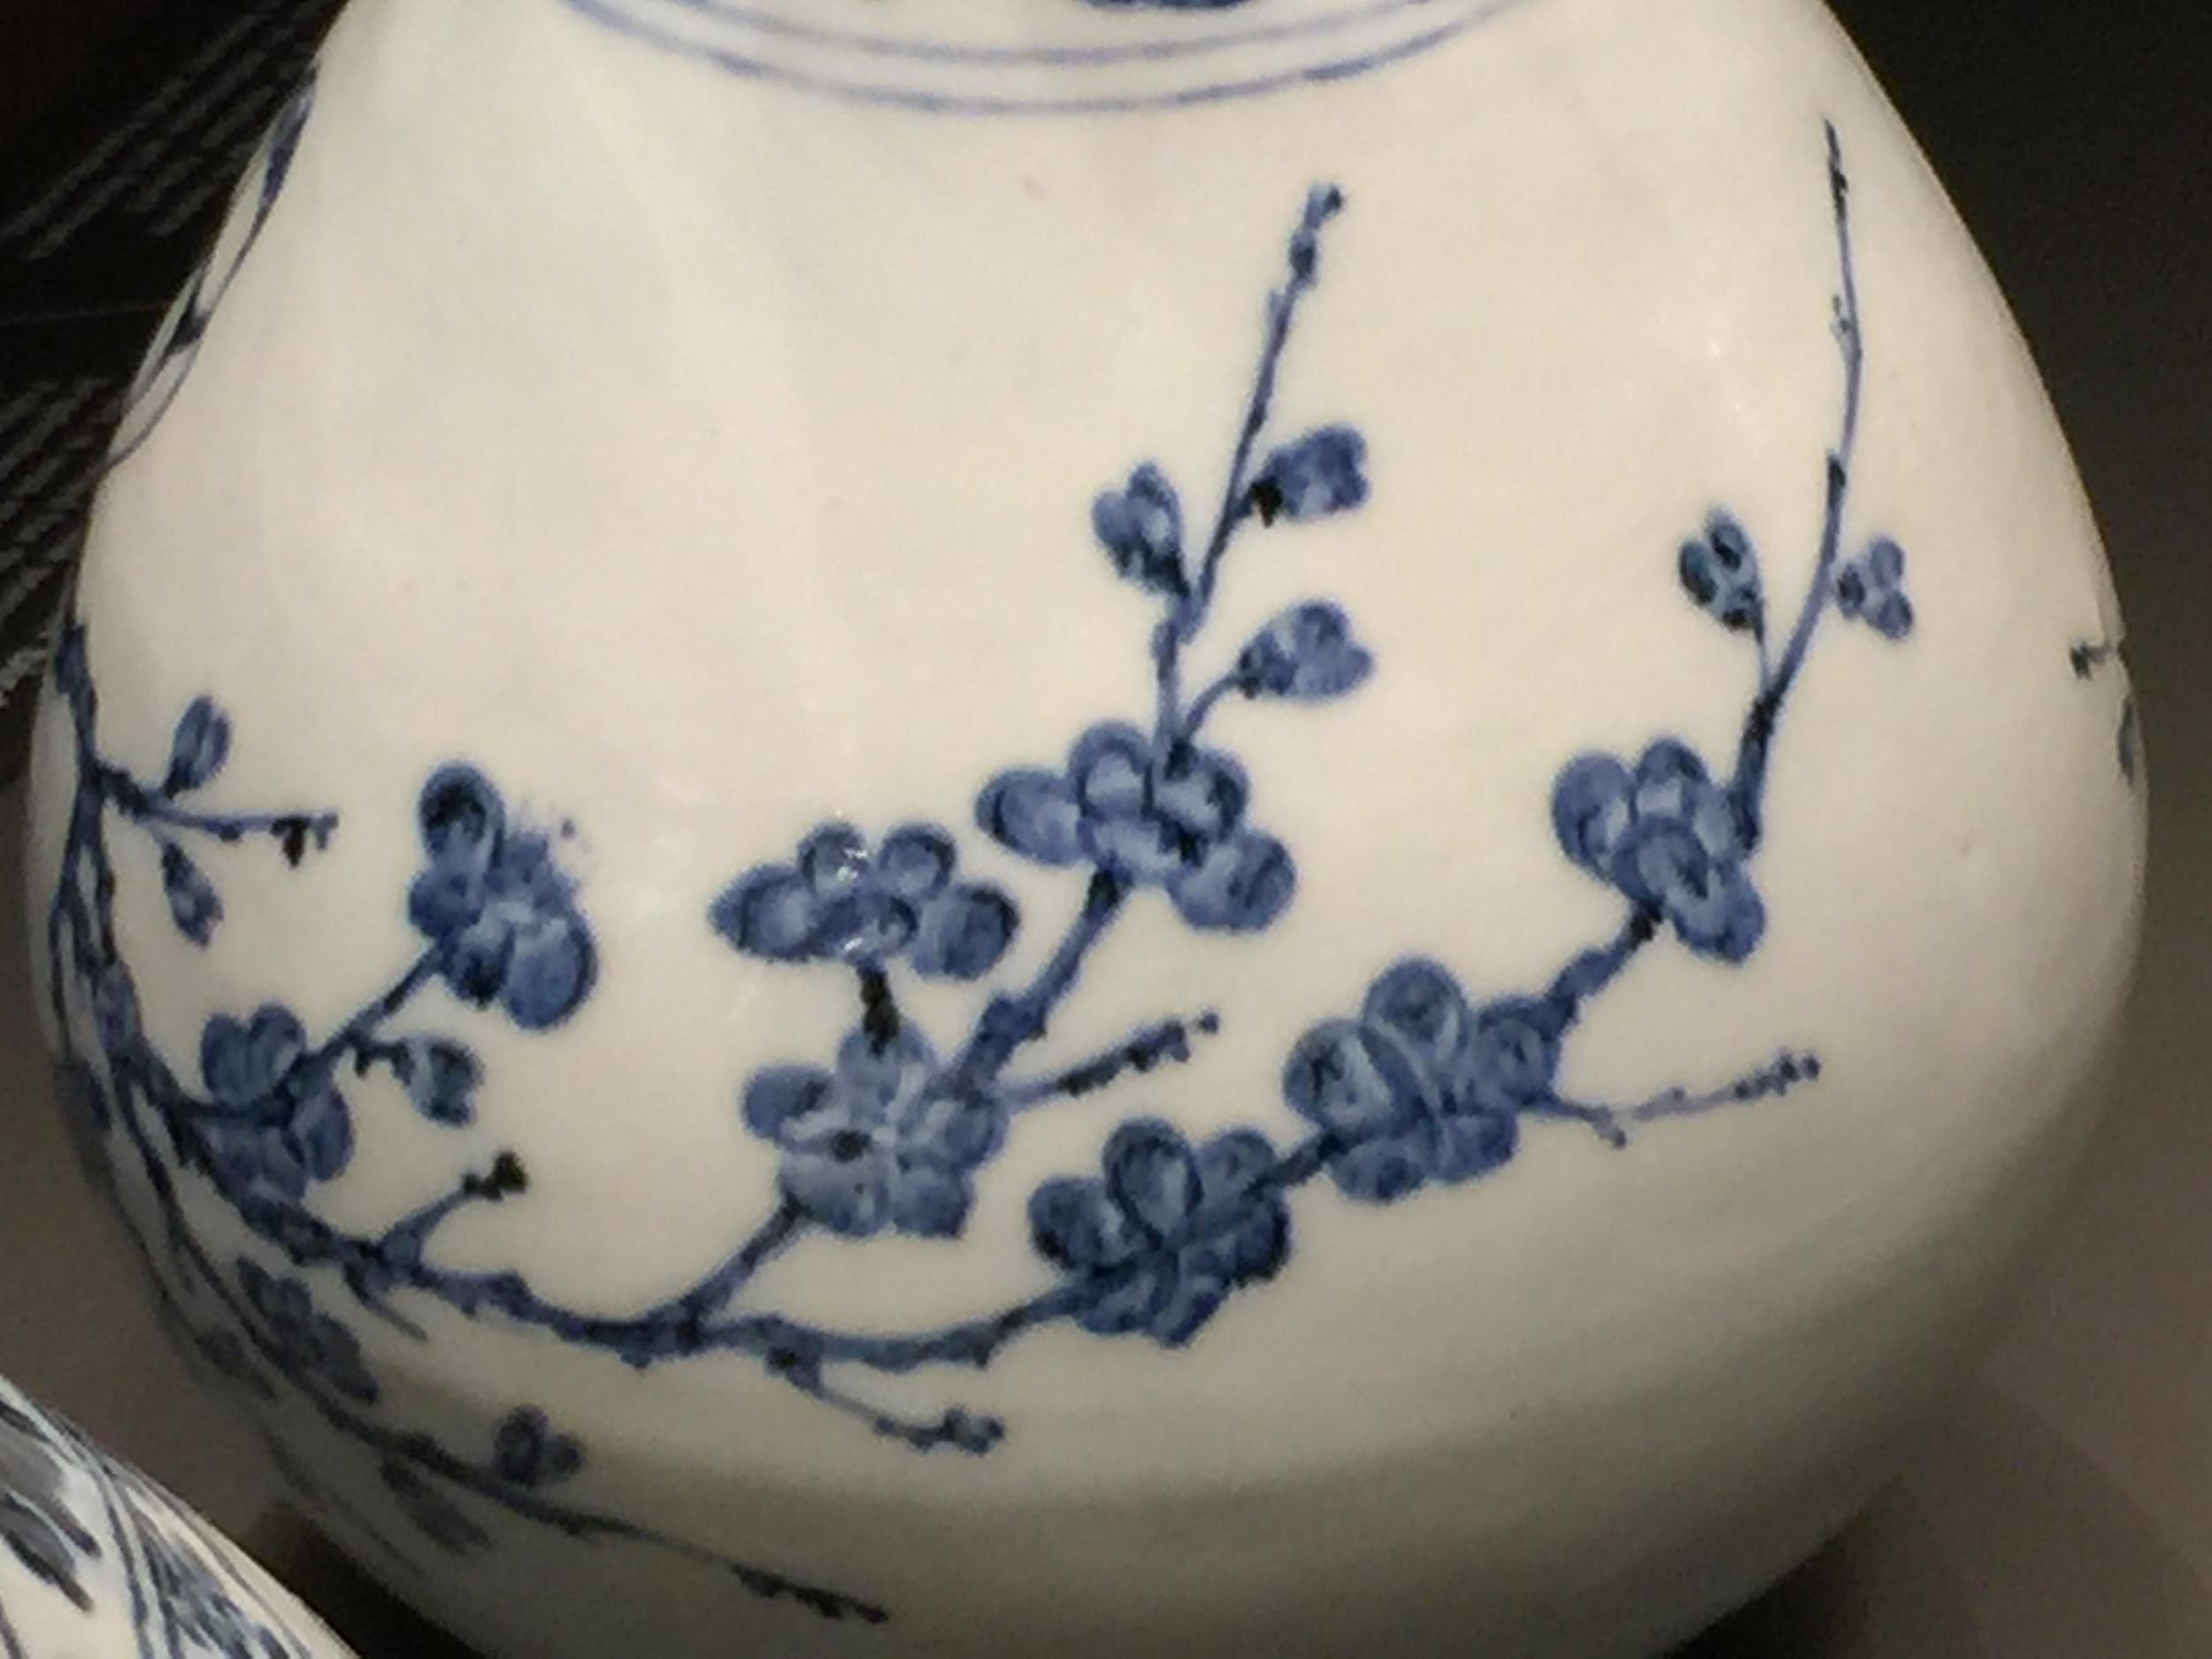 Chinese-Porcelain-British-Museum-Percival-David-jessewaugh.com-44.jpg